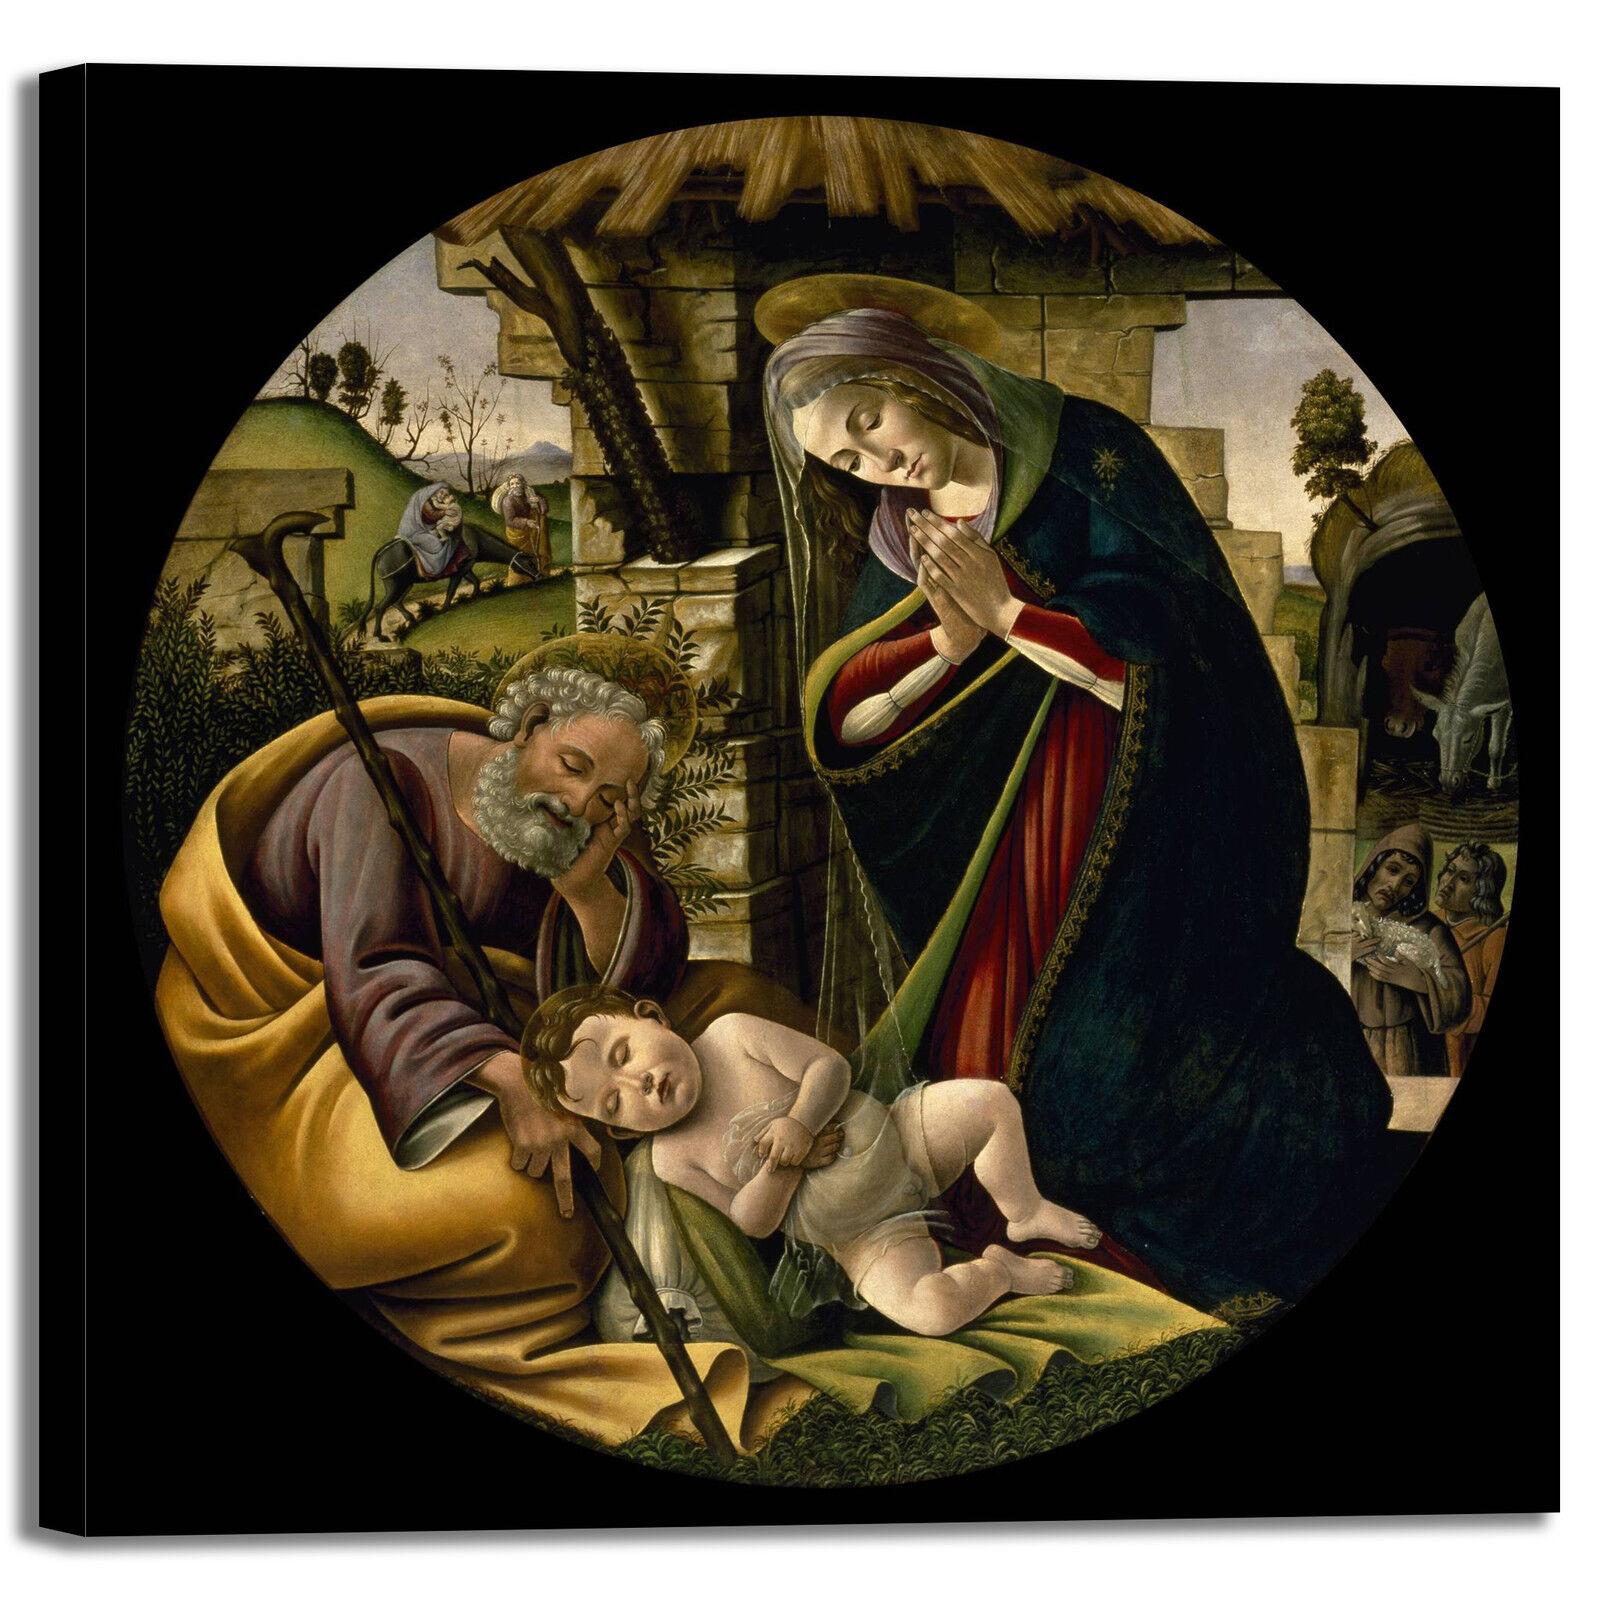 Botticelli adorazione Gesù design quadro quadro quadro stampa tela dipinto telaio arRouge o casa 6ef8b5